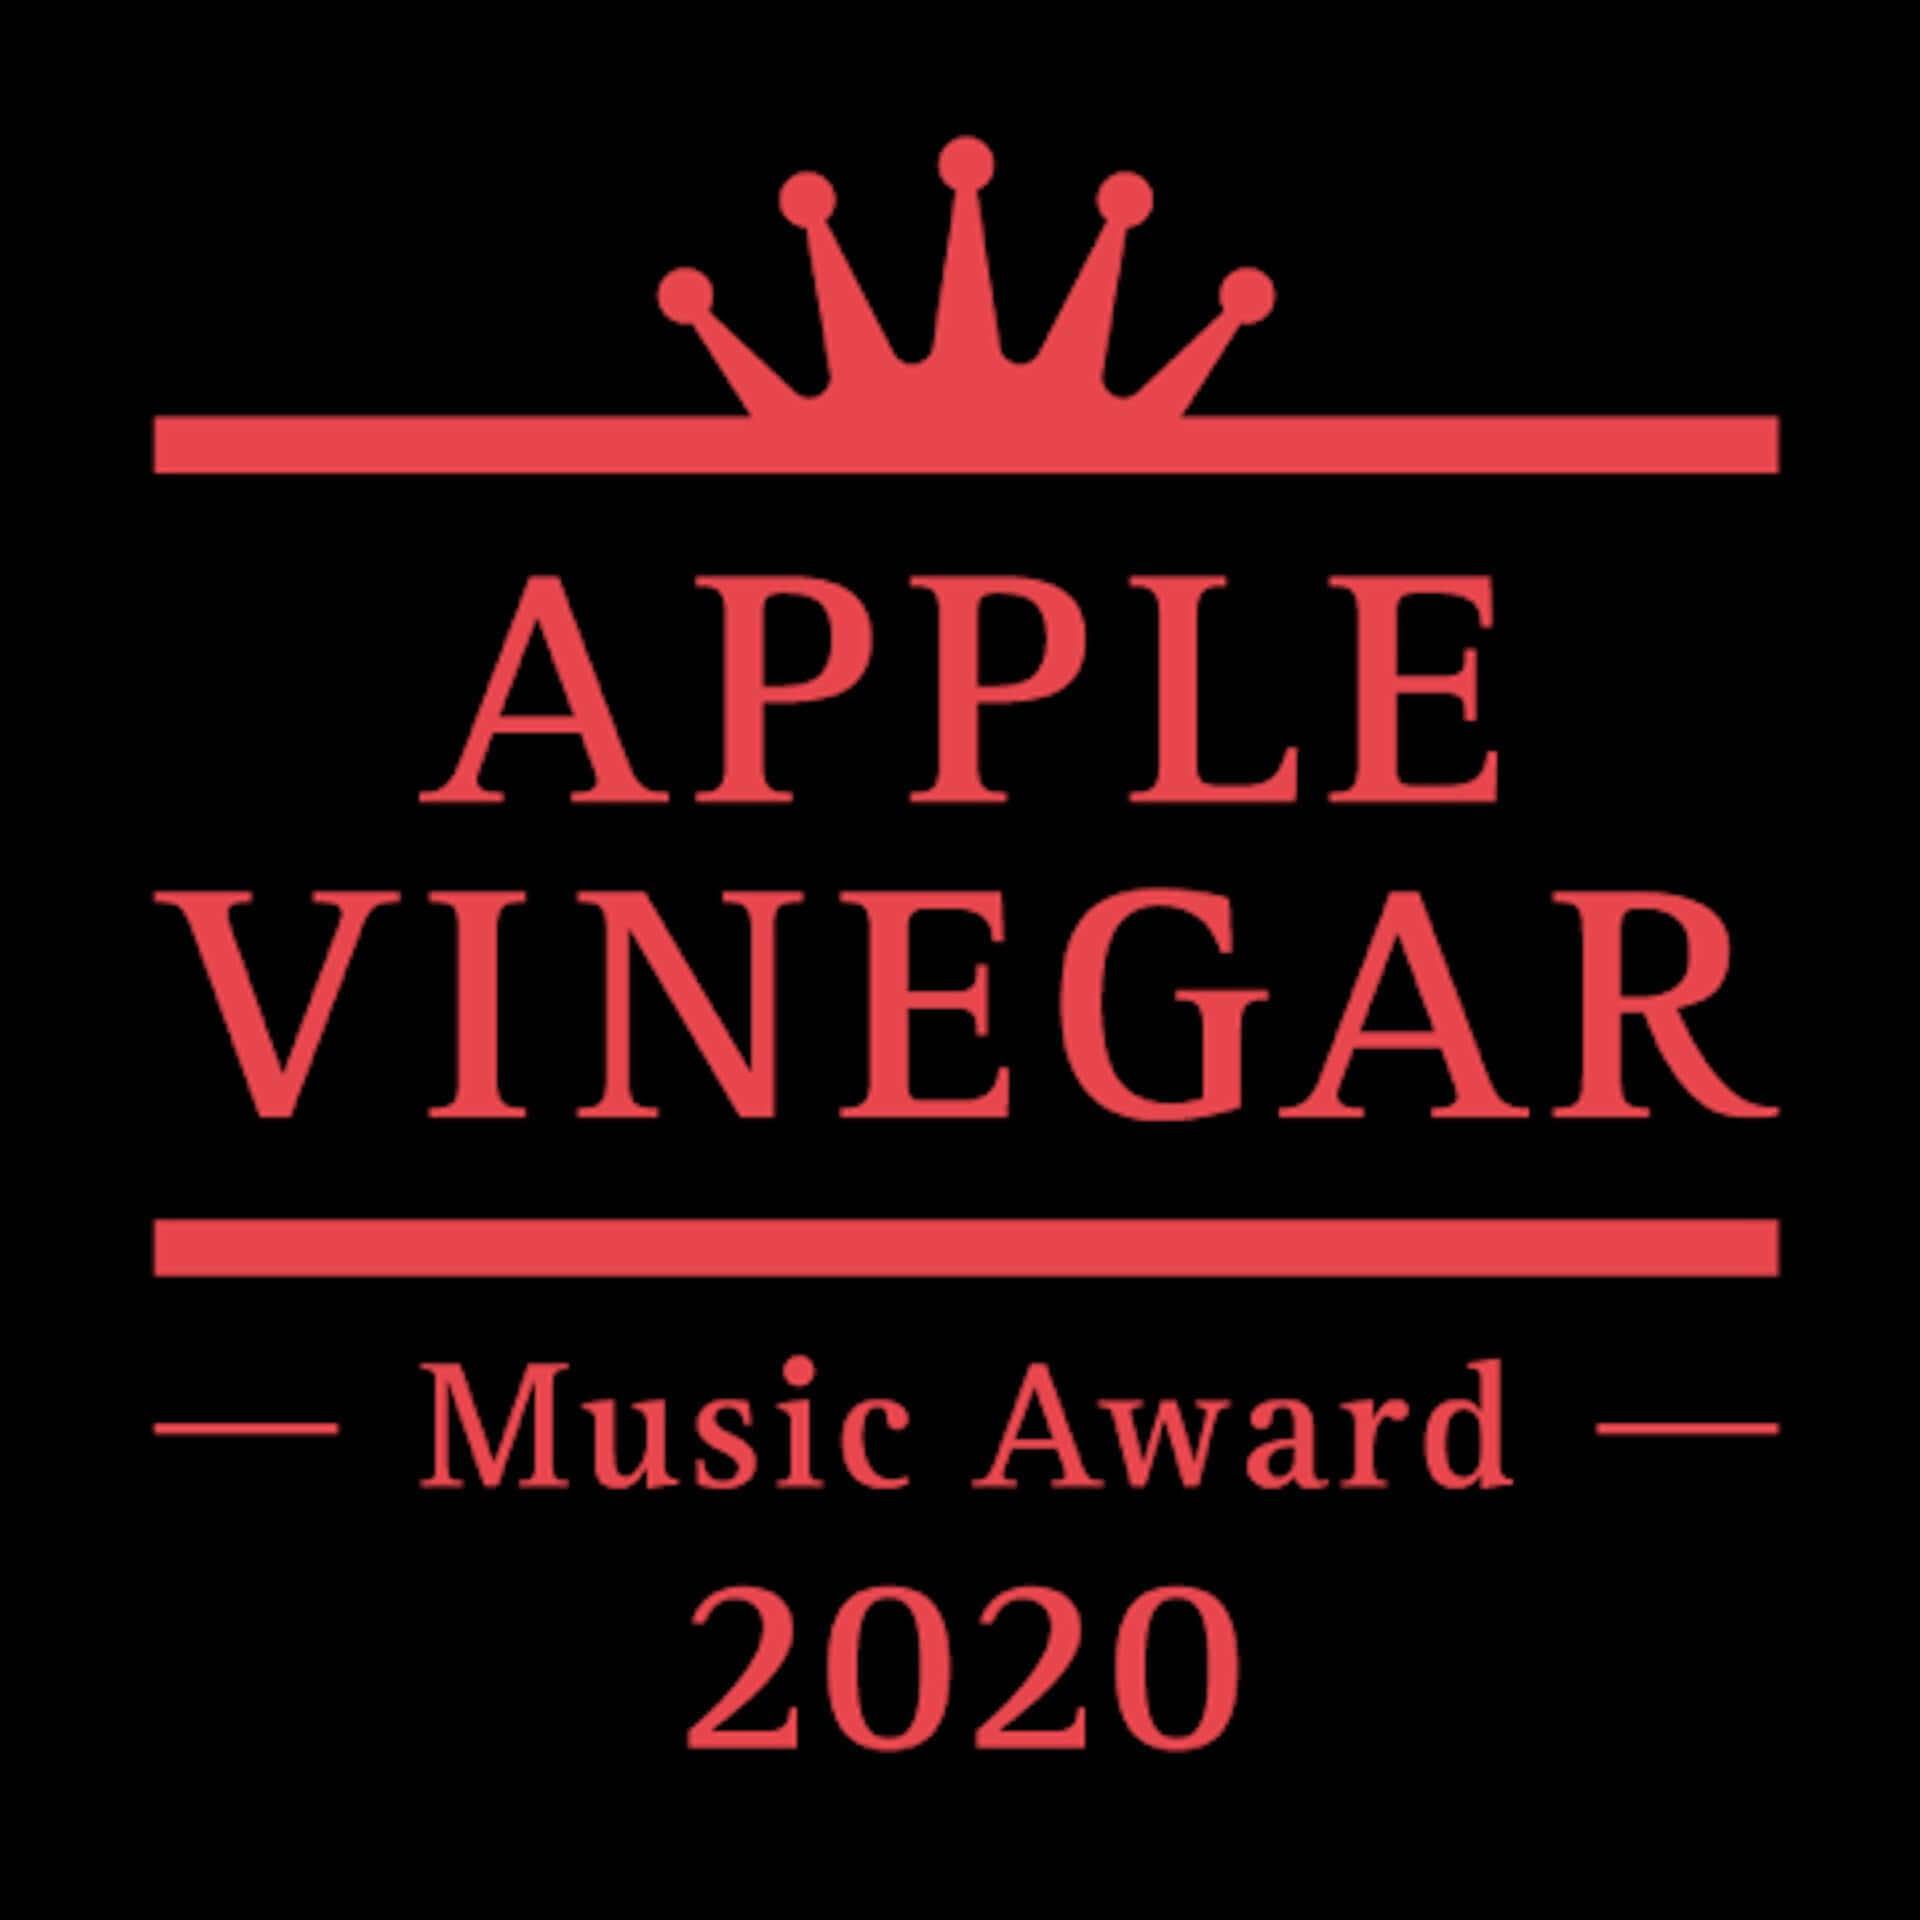 「APPLE VINEGAR -Music Award-」第3回大賞受賞者ROTH BART BARONと後藤正文の対談インタビューが公開! music200514_appplevinegar_03